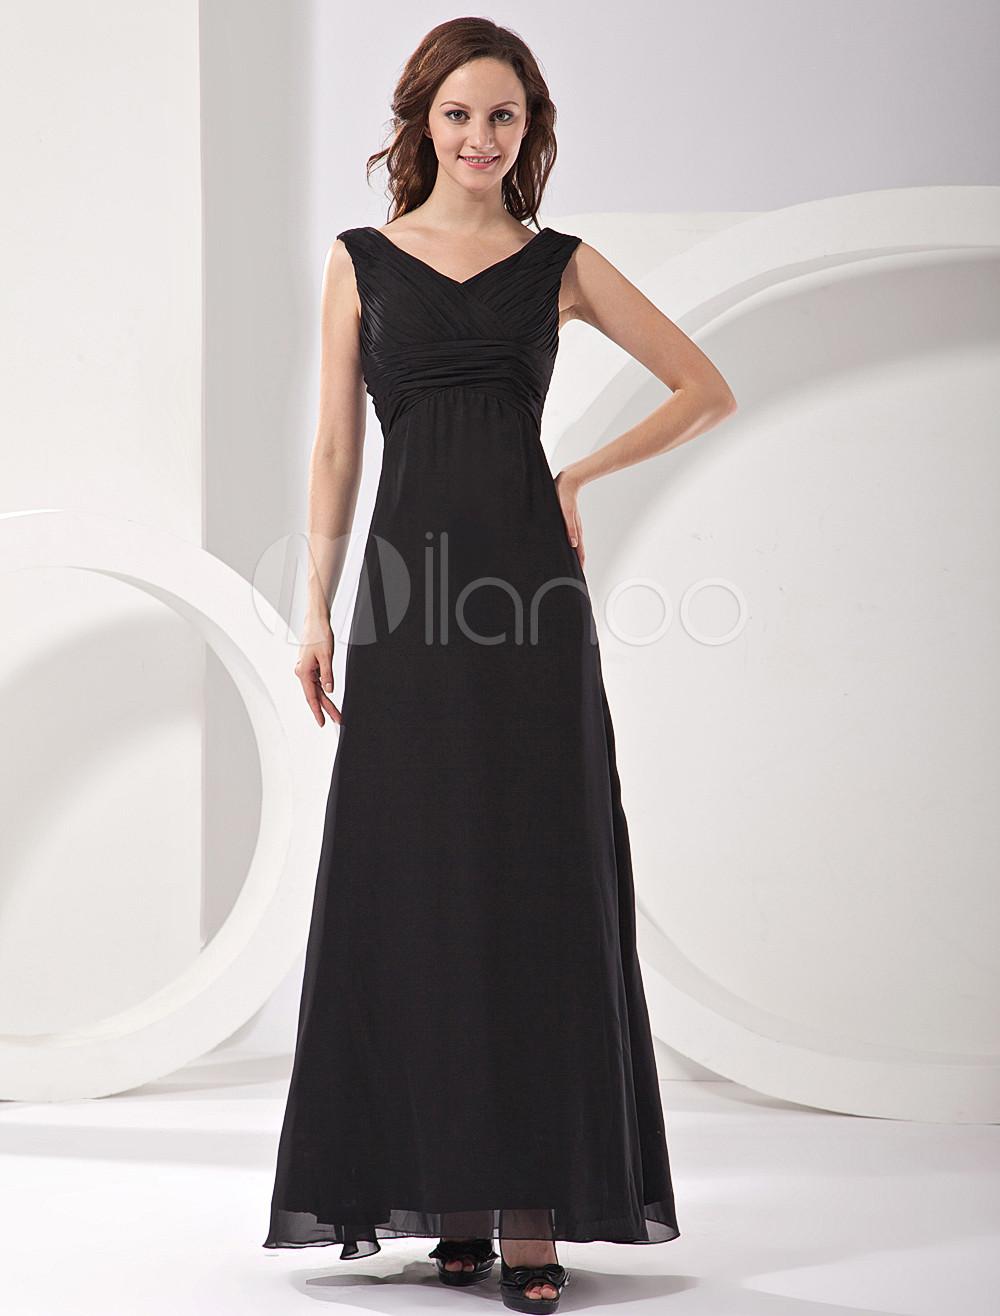 Elegant Black V-Neck Chiffon Satin Mother Of Bride And Groom Dress